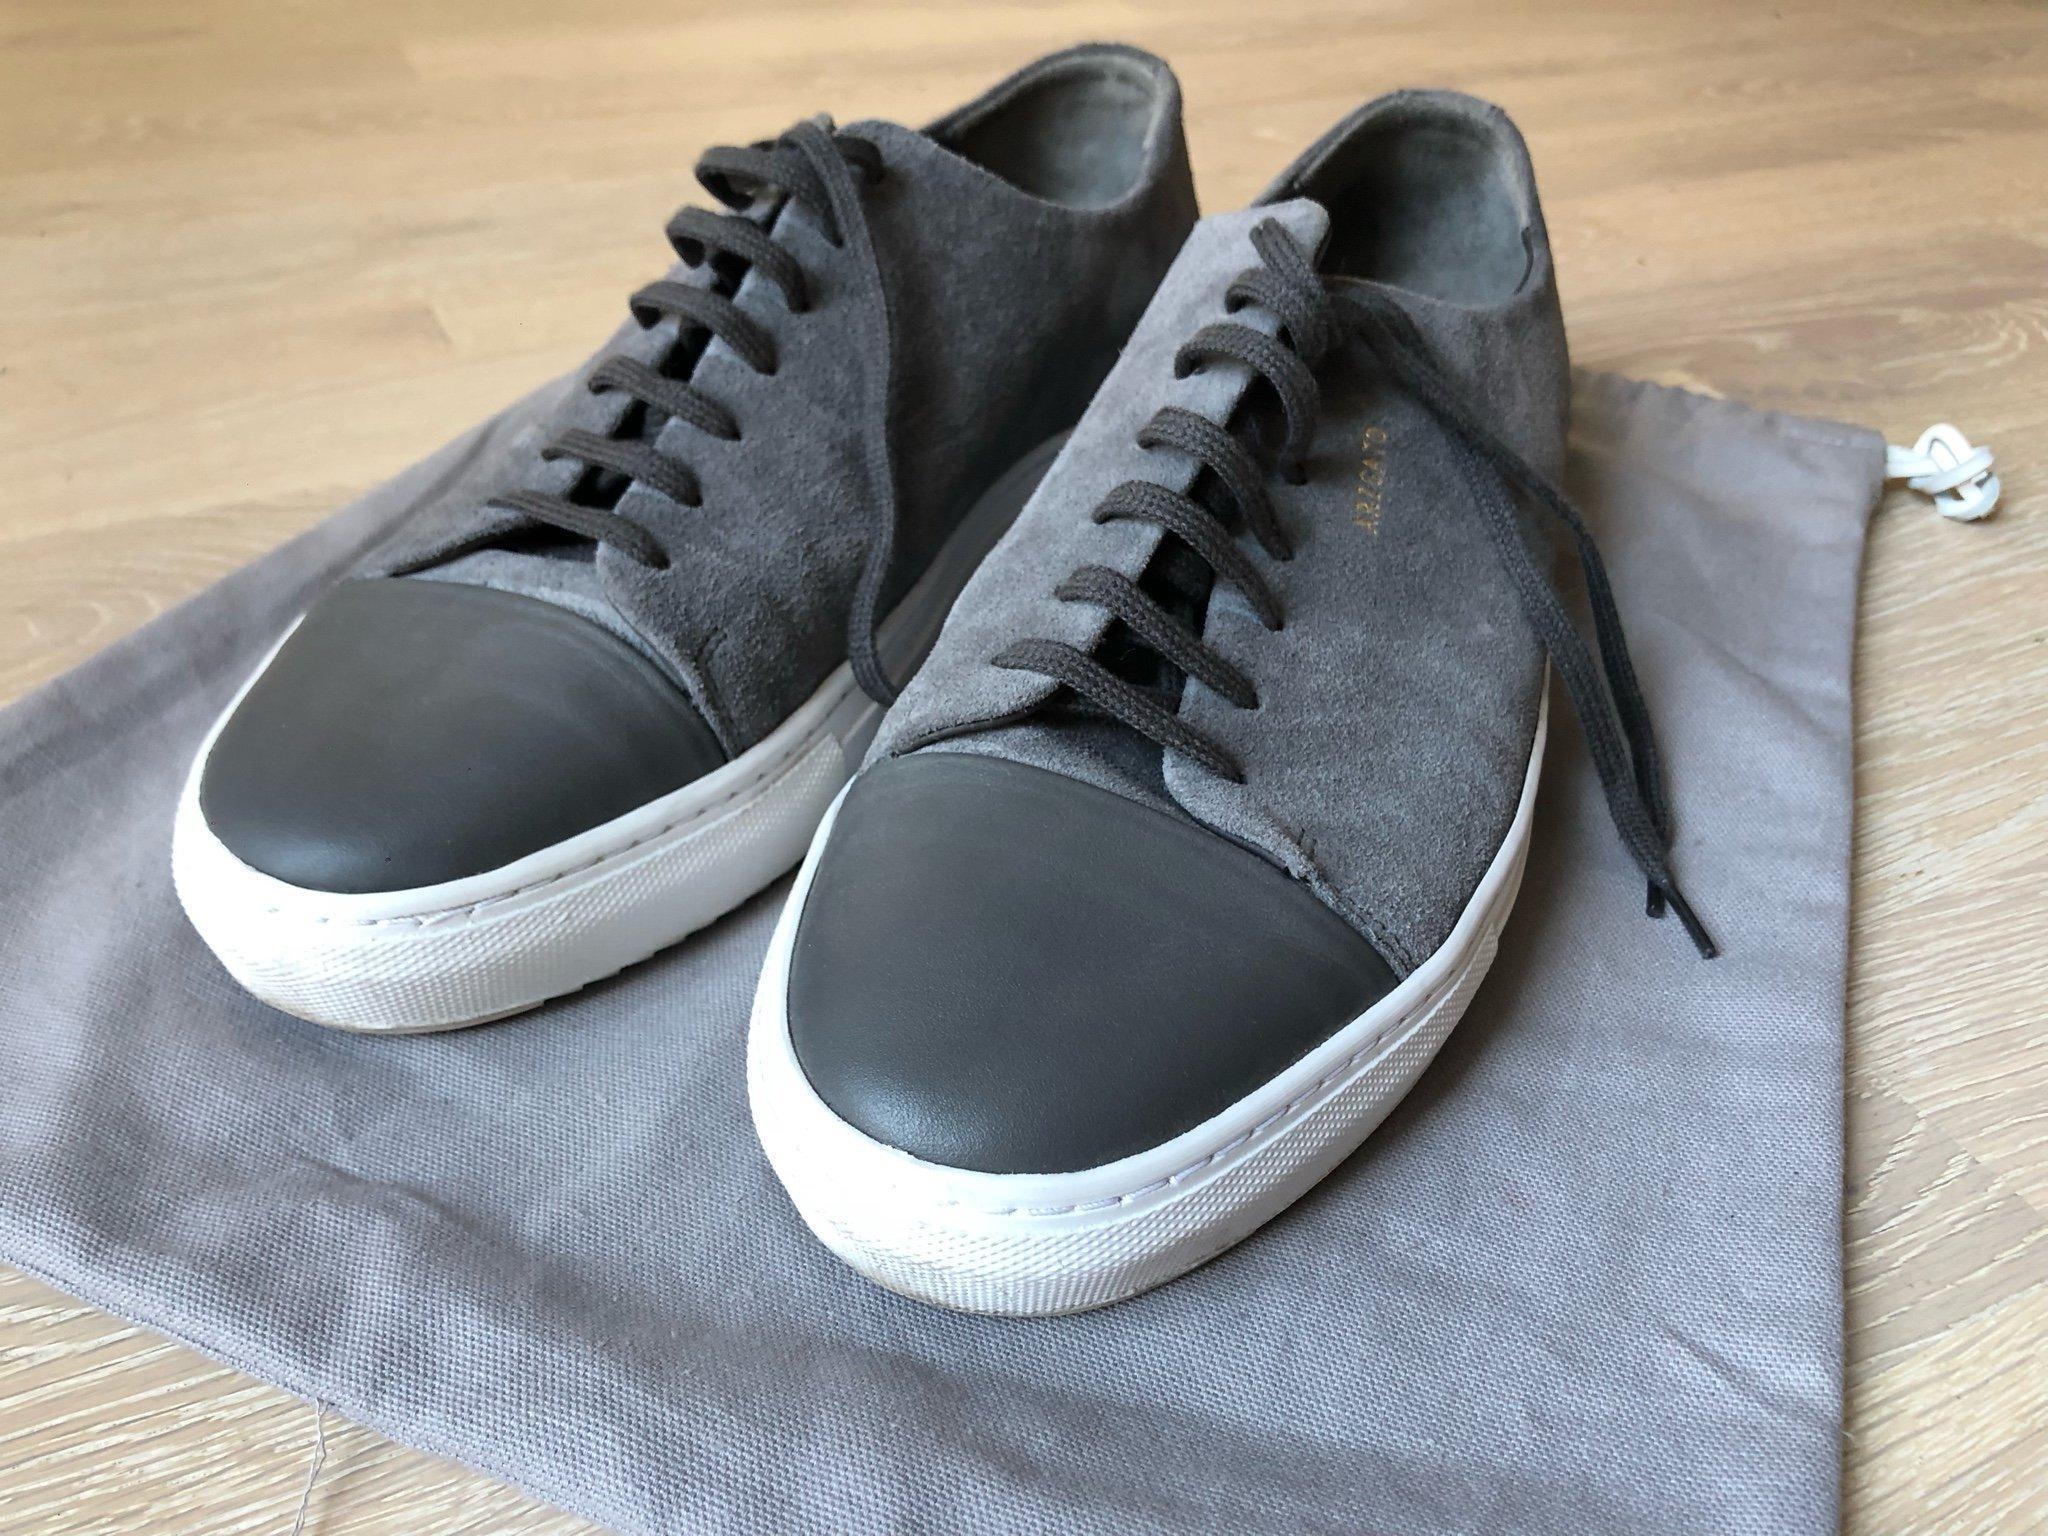 c2914899068 Axel Arigato mörkgrå cap-toe sneakers storlek 44 (348196910) ᐈ Köp ...